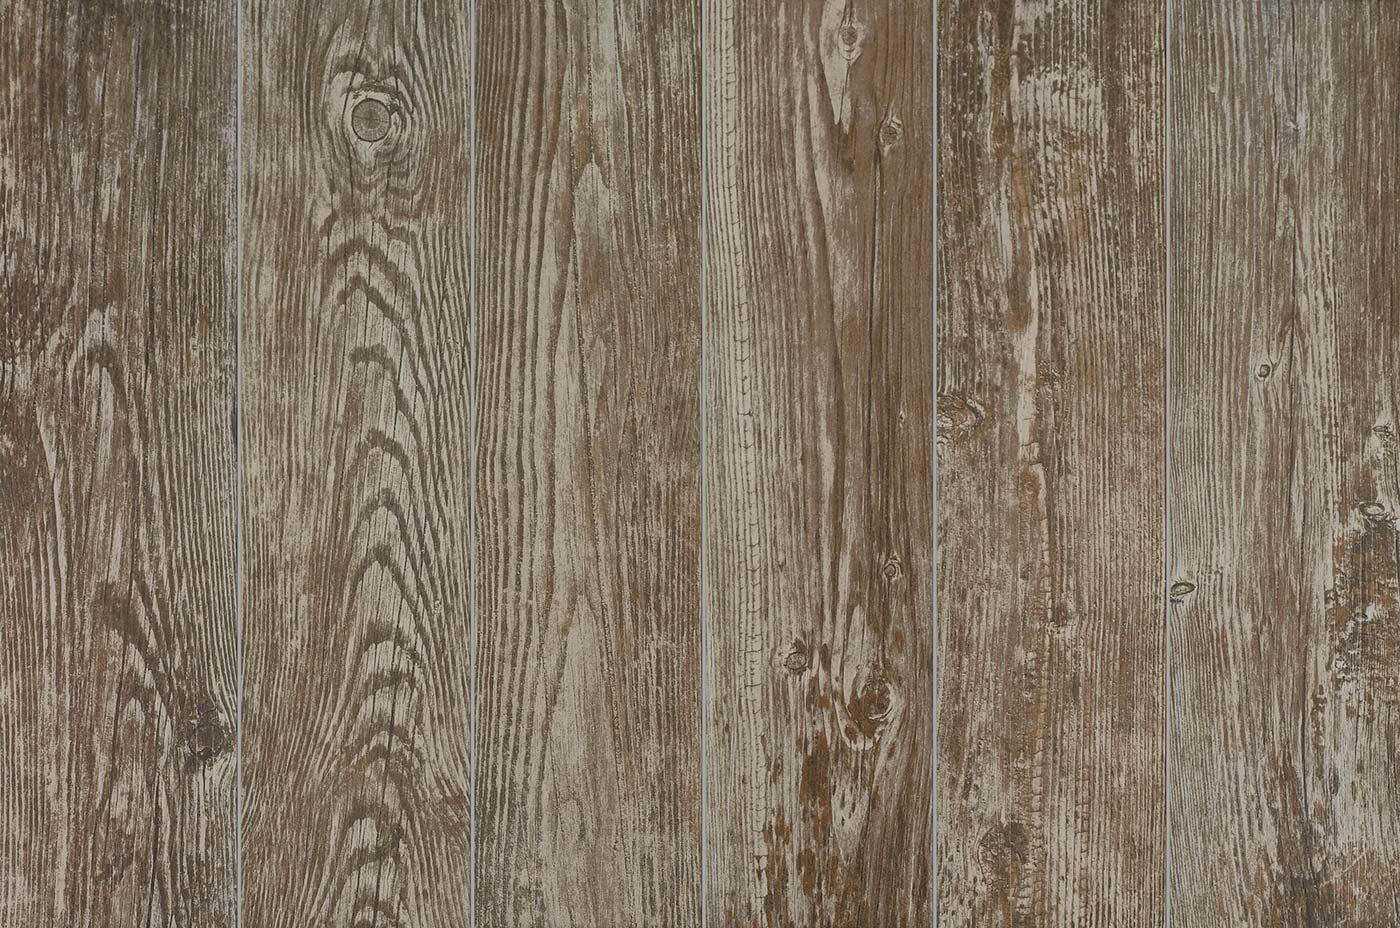 Forest Rain Wood Look Tile